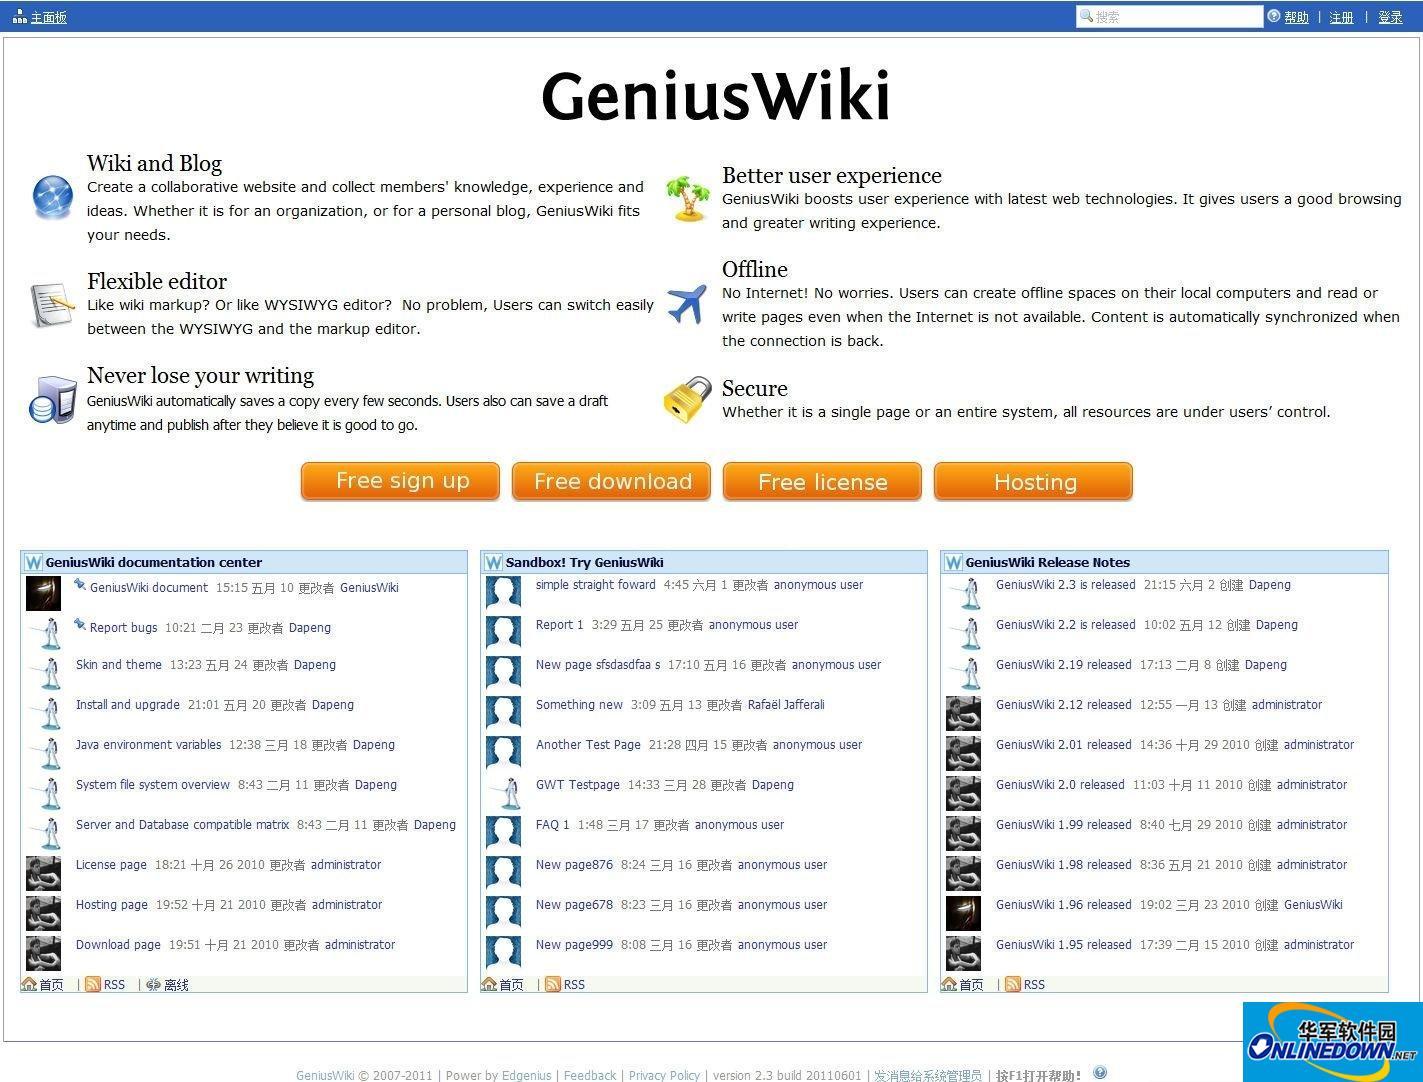 GeniusWiki 基于java的百科系统 3.0 多国语言版